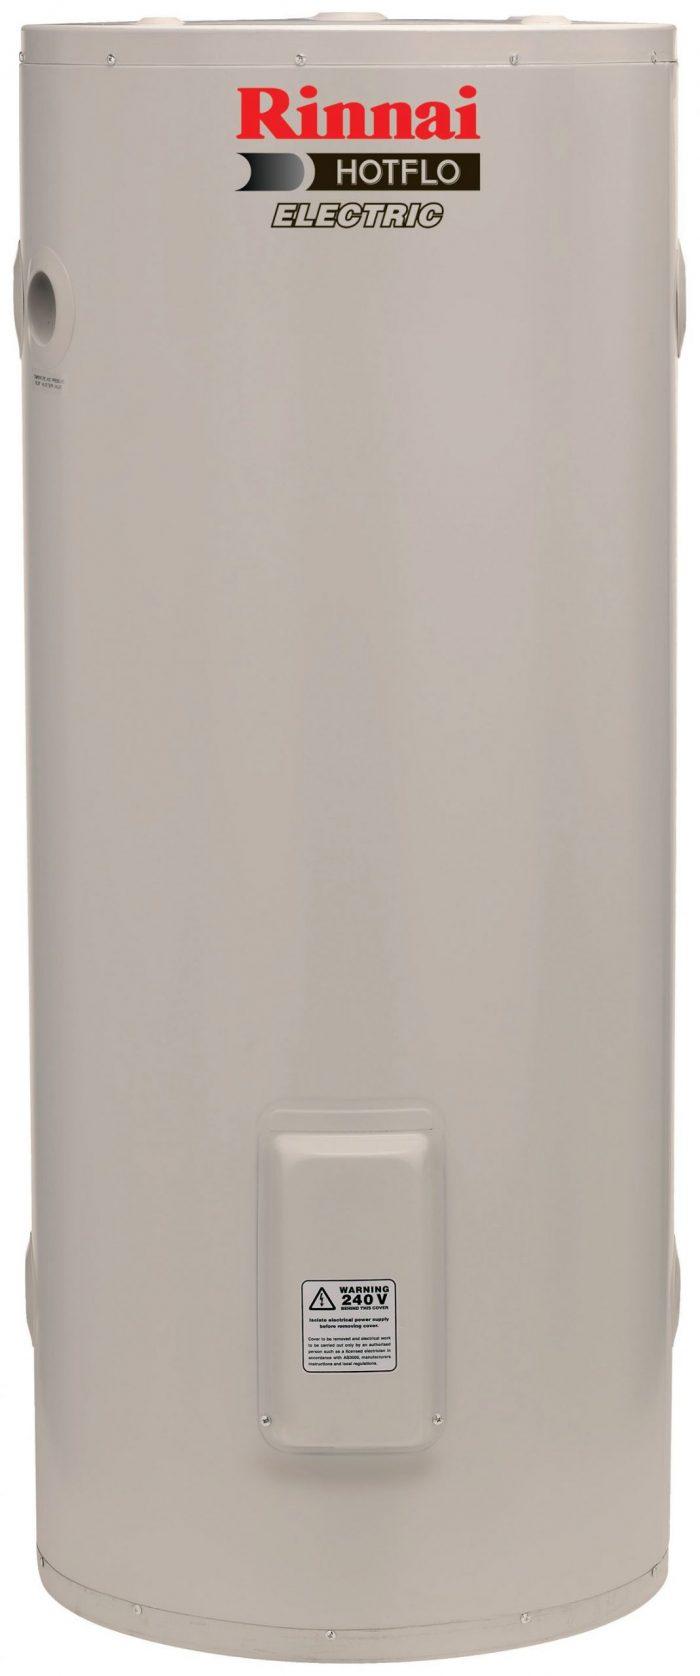 Hotflo Electric Hot Water Storage 125L